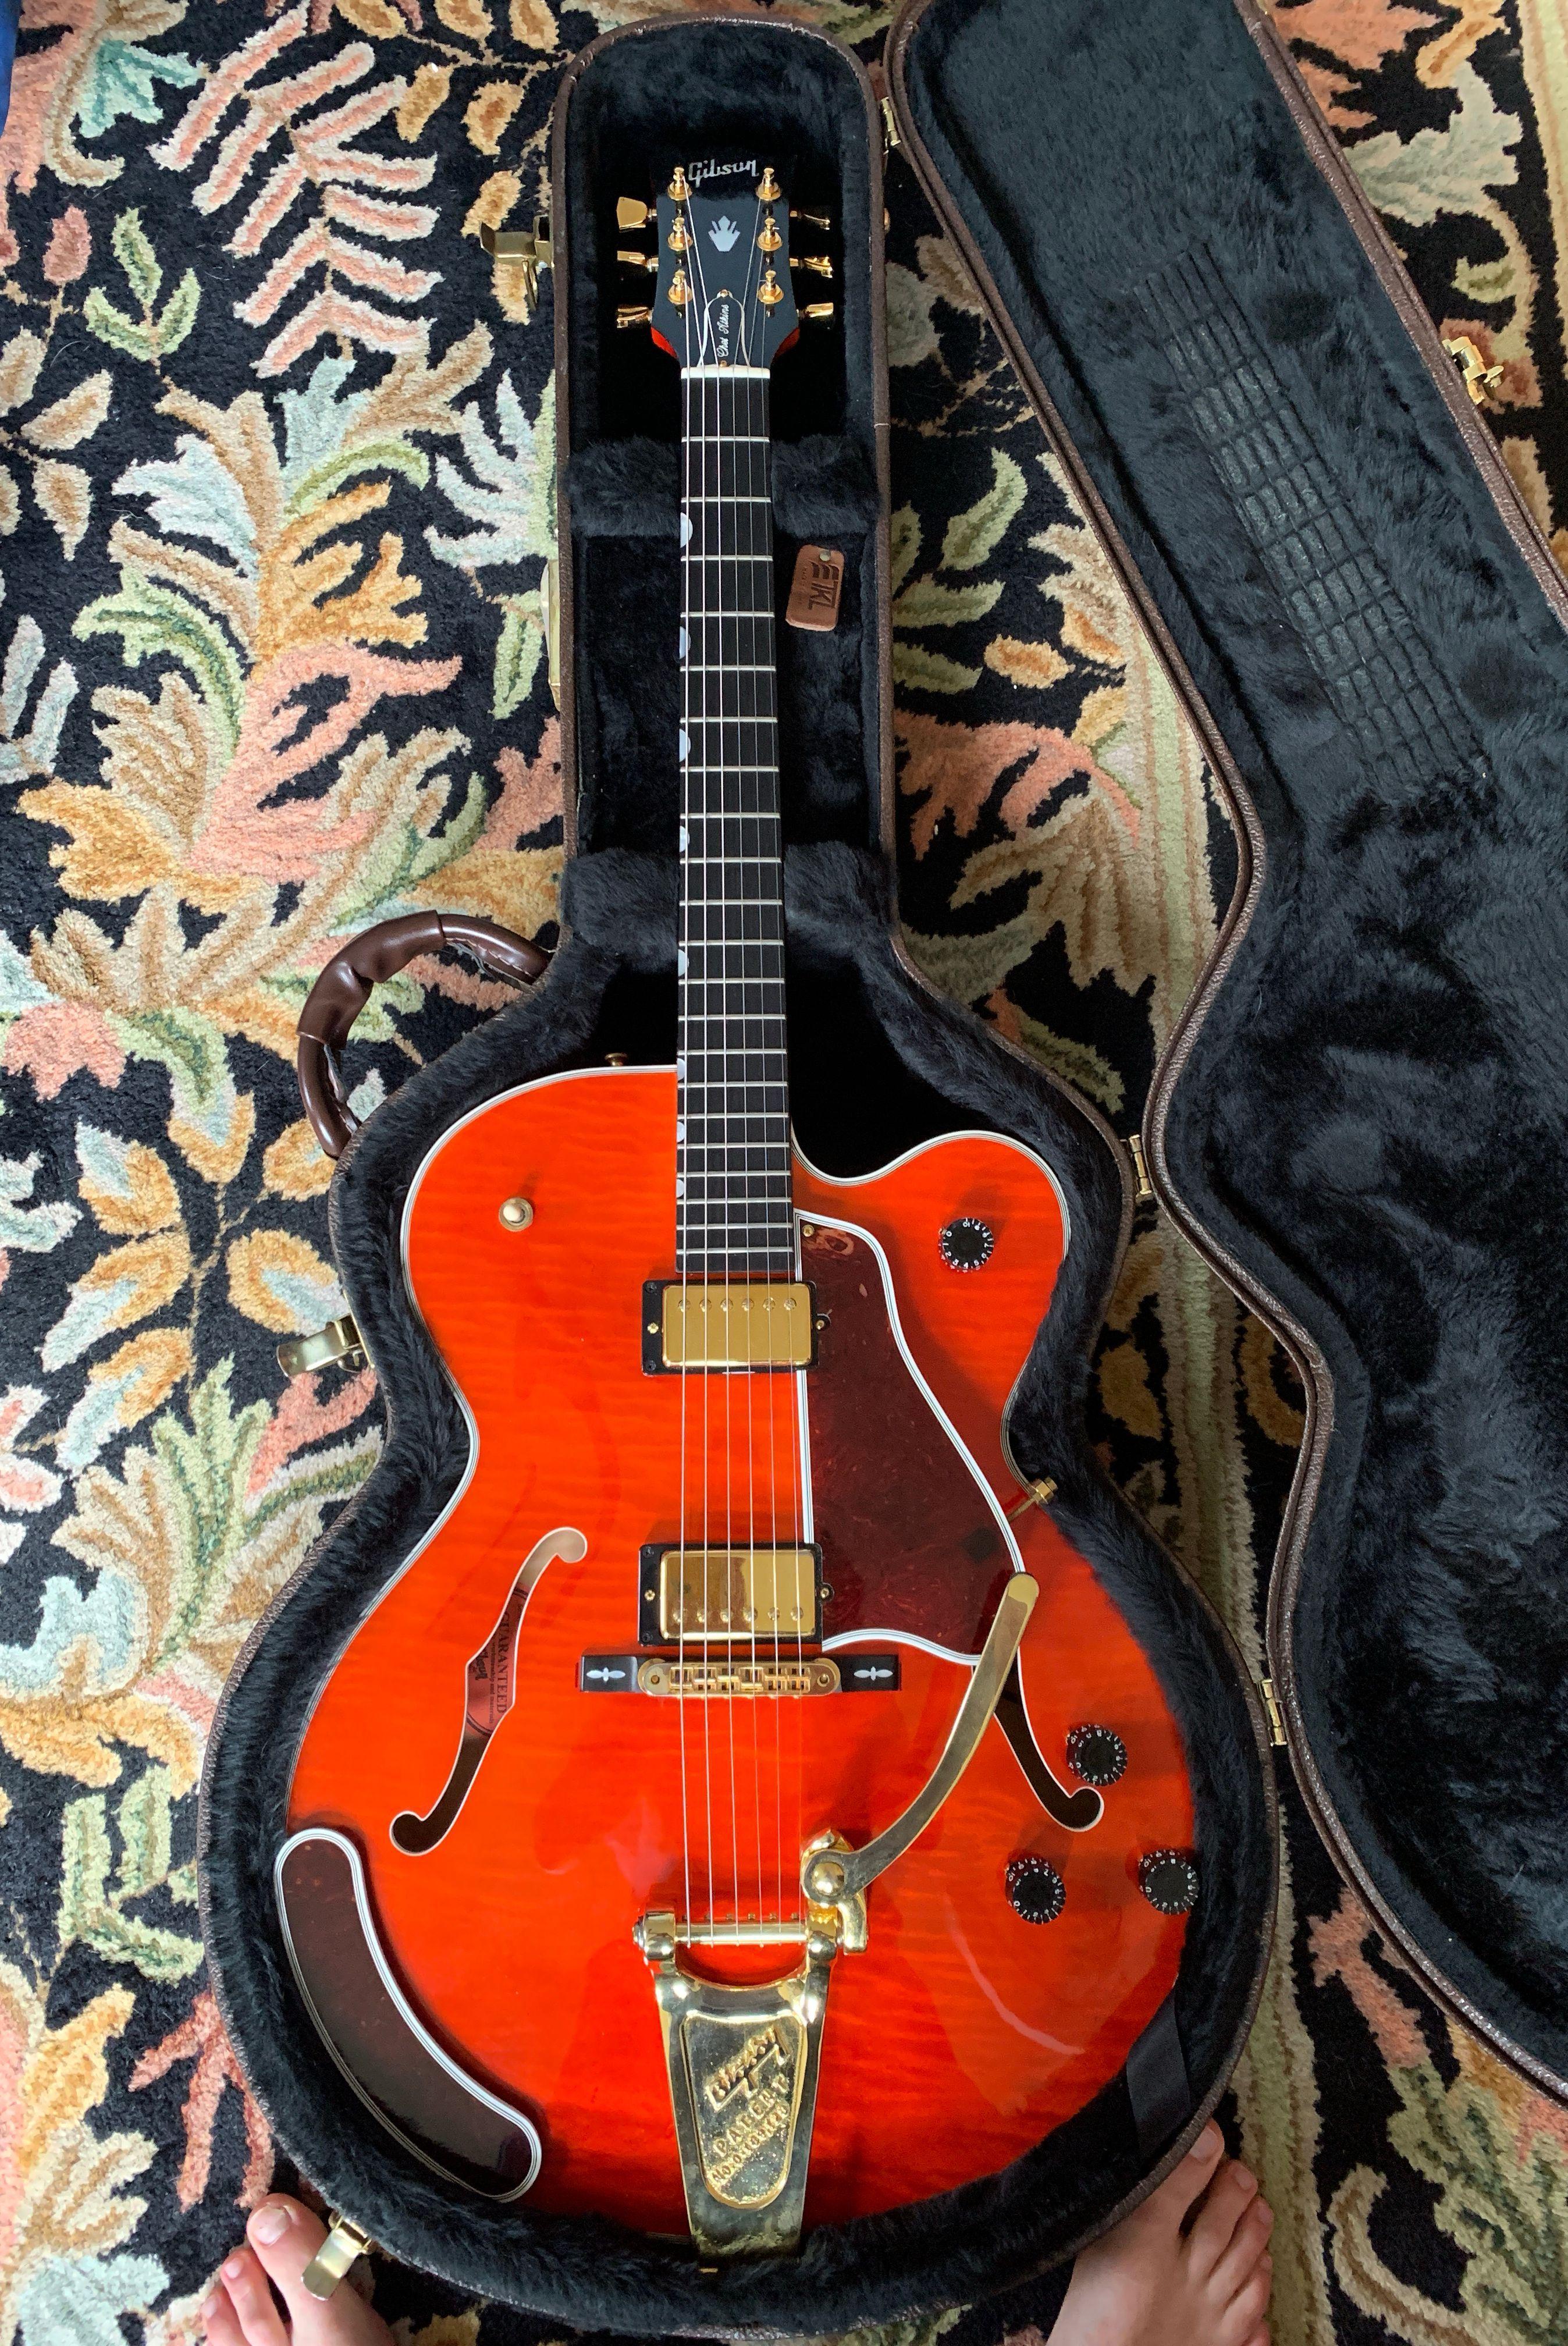 Gibson Country Gentleman 2003 Orange Sunrise Dan S Gear Depot Reverb Electric Guitar And Amp Gibson Guitars Beautiful Guitars